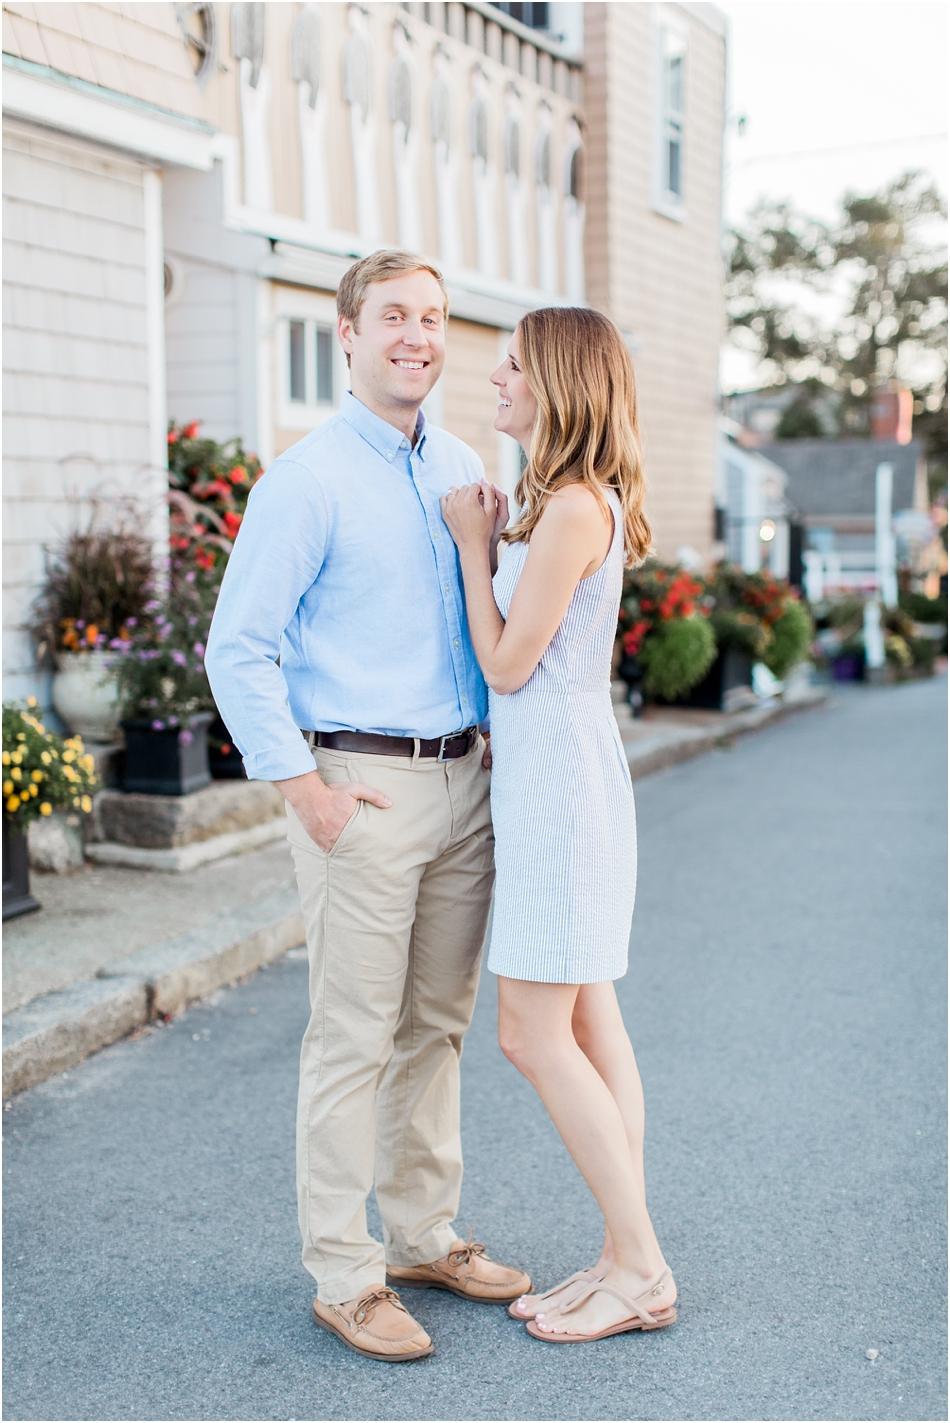 rockport_ma_engagement_kelly_zach_cape_cod_boston_new_england_wedding_photographer_Meredith_Jane_Photography_photo_2335.jpg